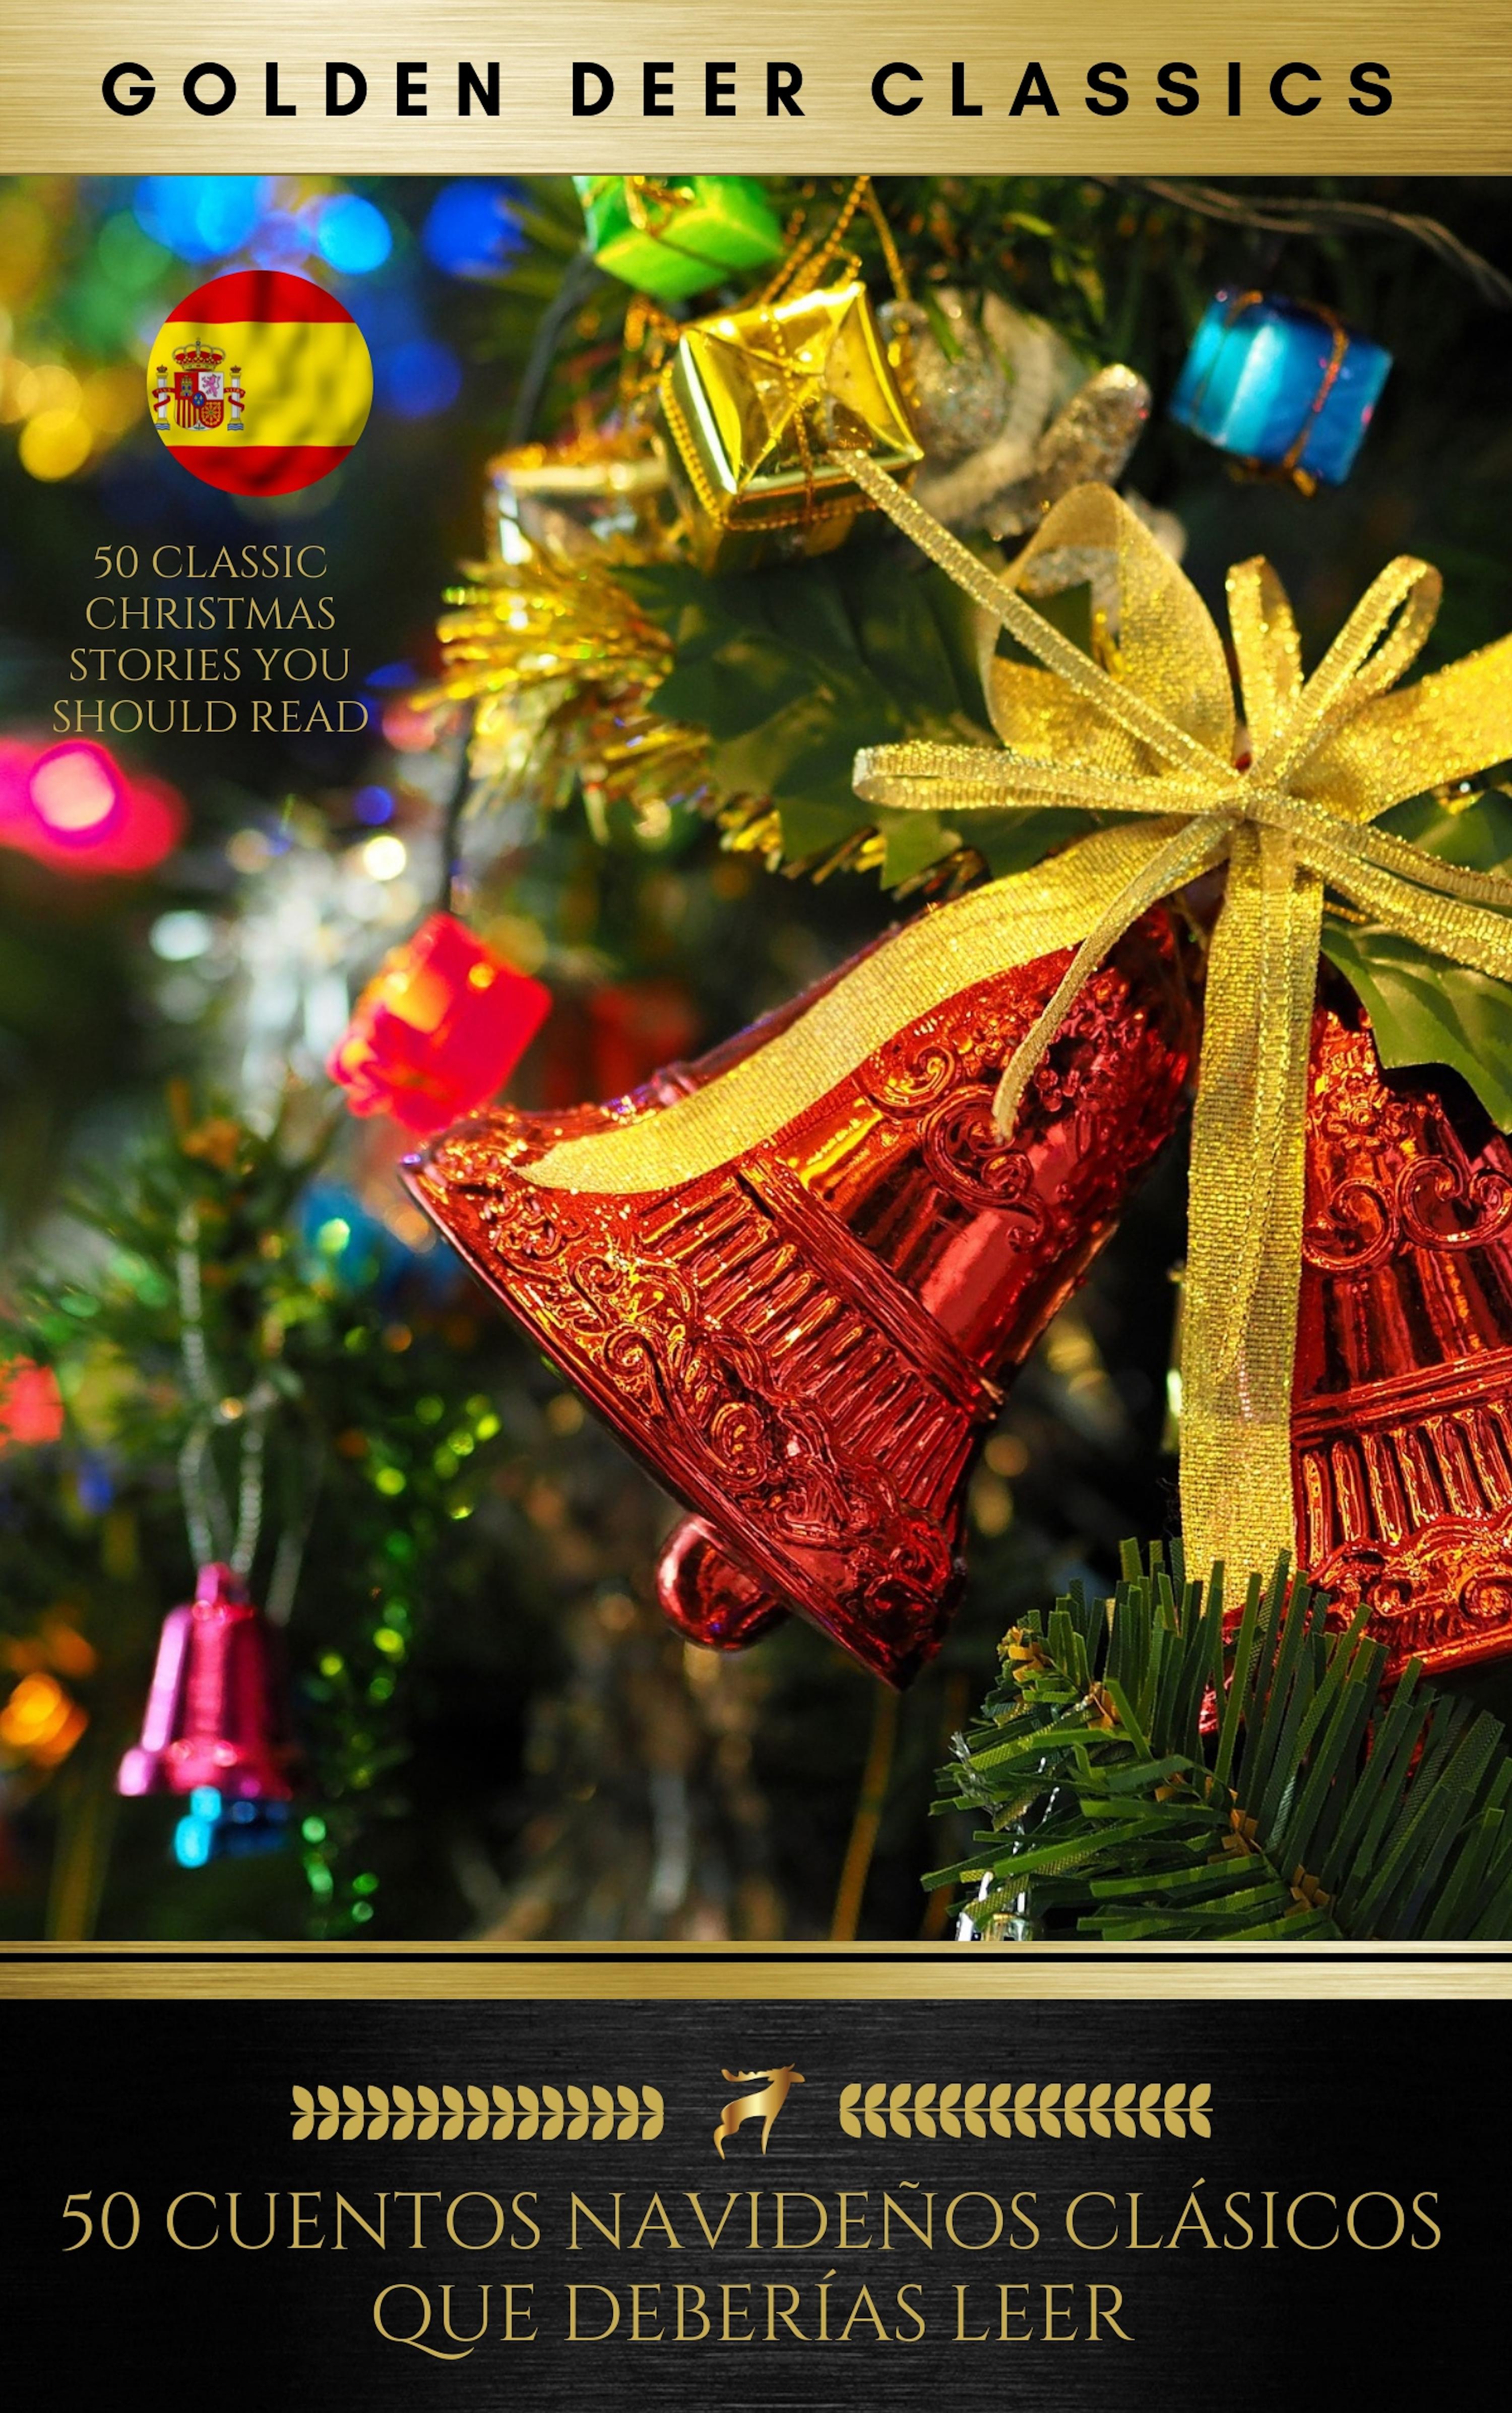 50 cuentos navidenos clasicos que deberias leer golden deer classics